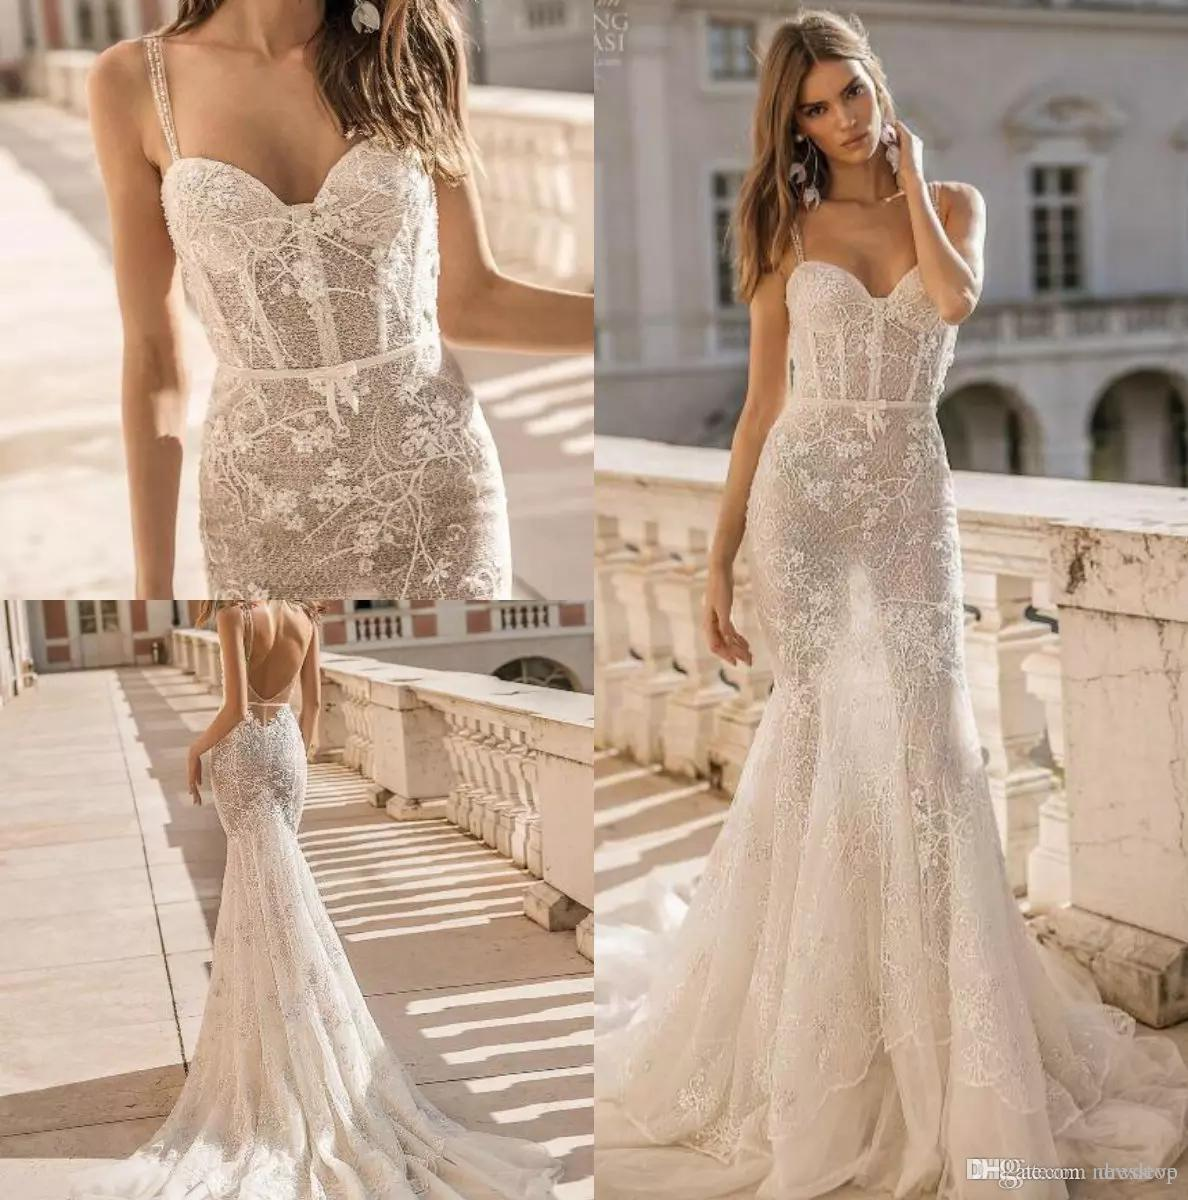 1868de52b2b Berta Privée 2019 Mermaid Wedding Dresses Spaghetti Backless Lace Bridal  Gowns See Through Boho Beach Wedding Dresses Simple Robe De Mariée One  Shoulder ...